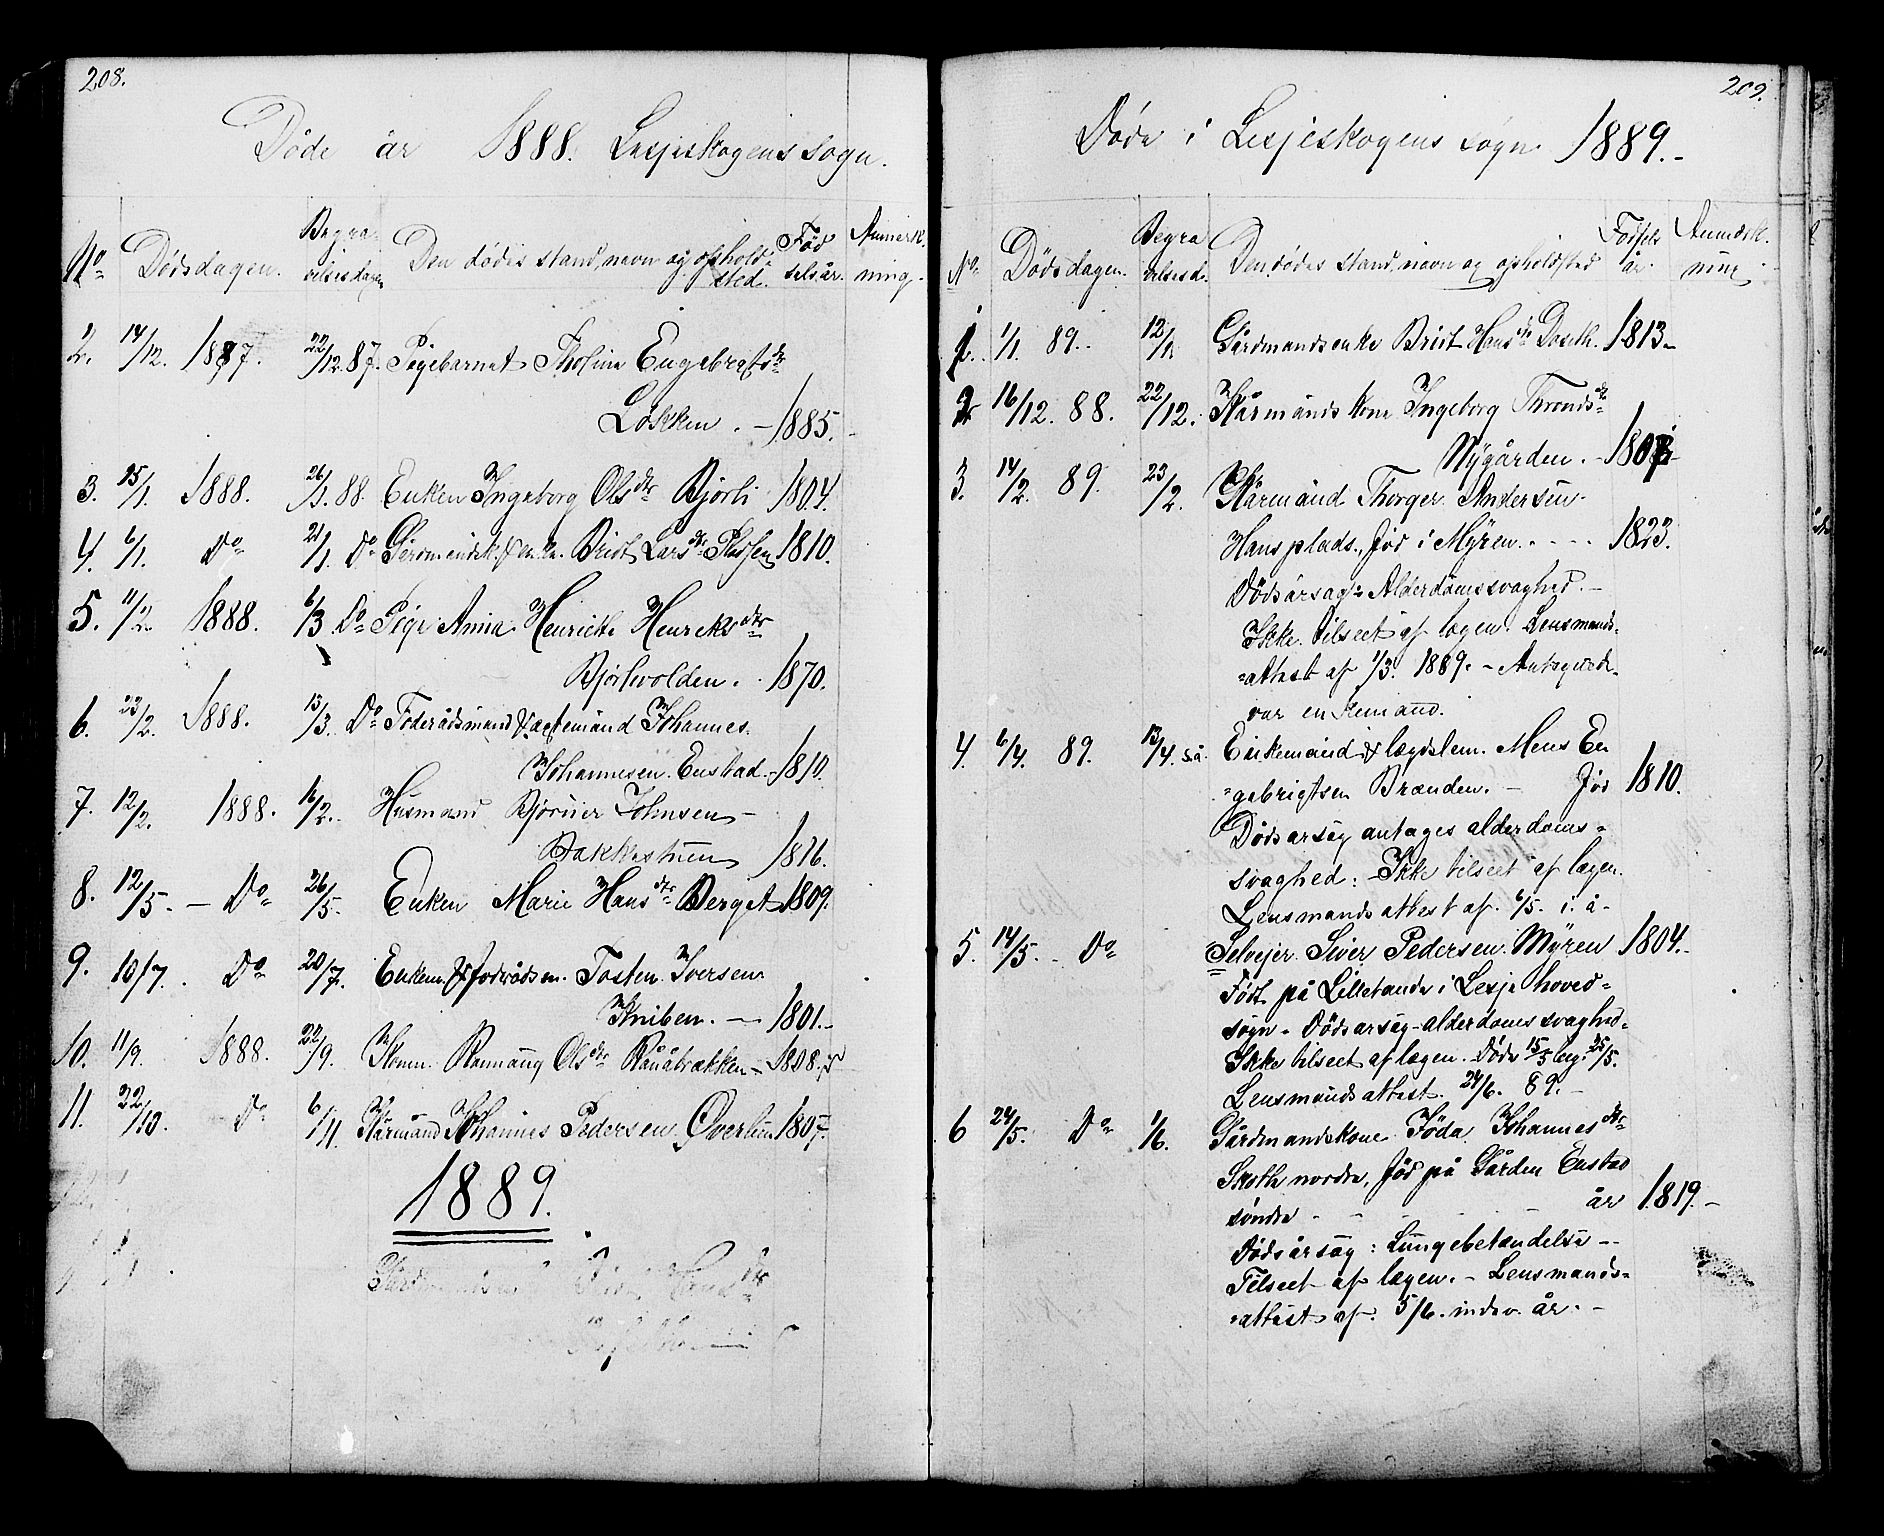 SAH, Lesja prestekontor, Klokkerbok nr. 6, 1871-1904, s. 208-209